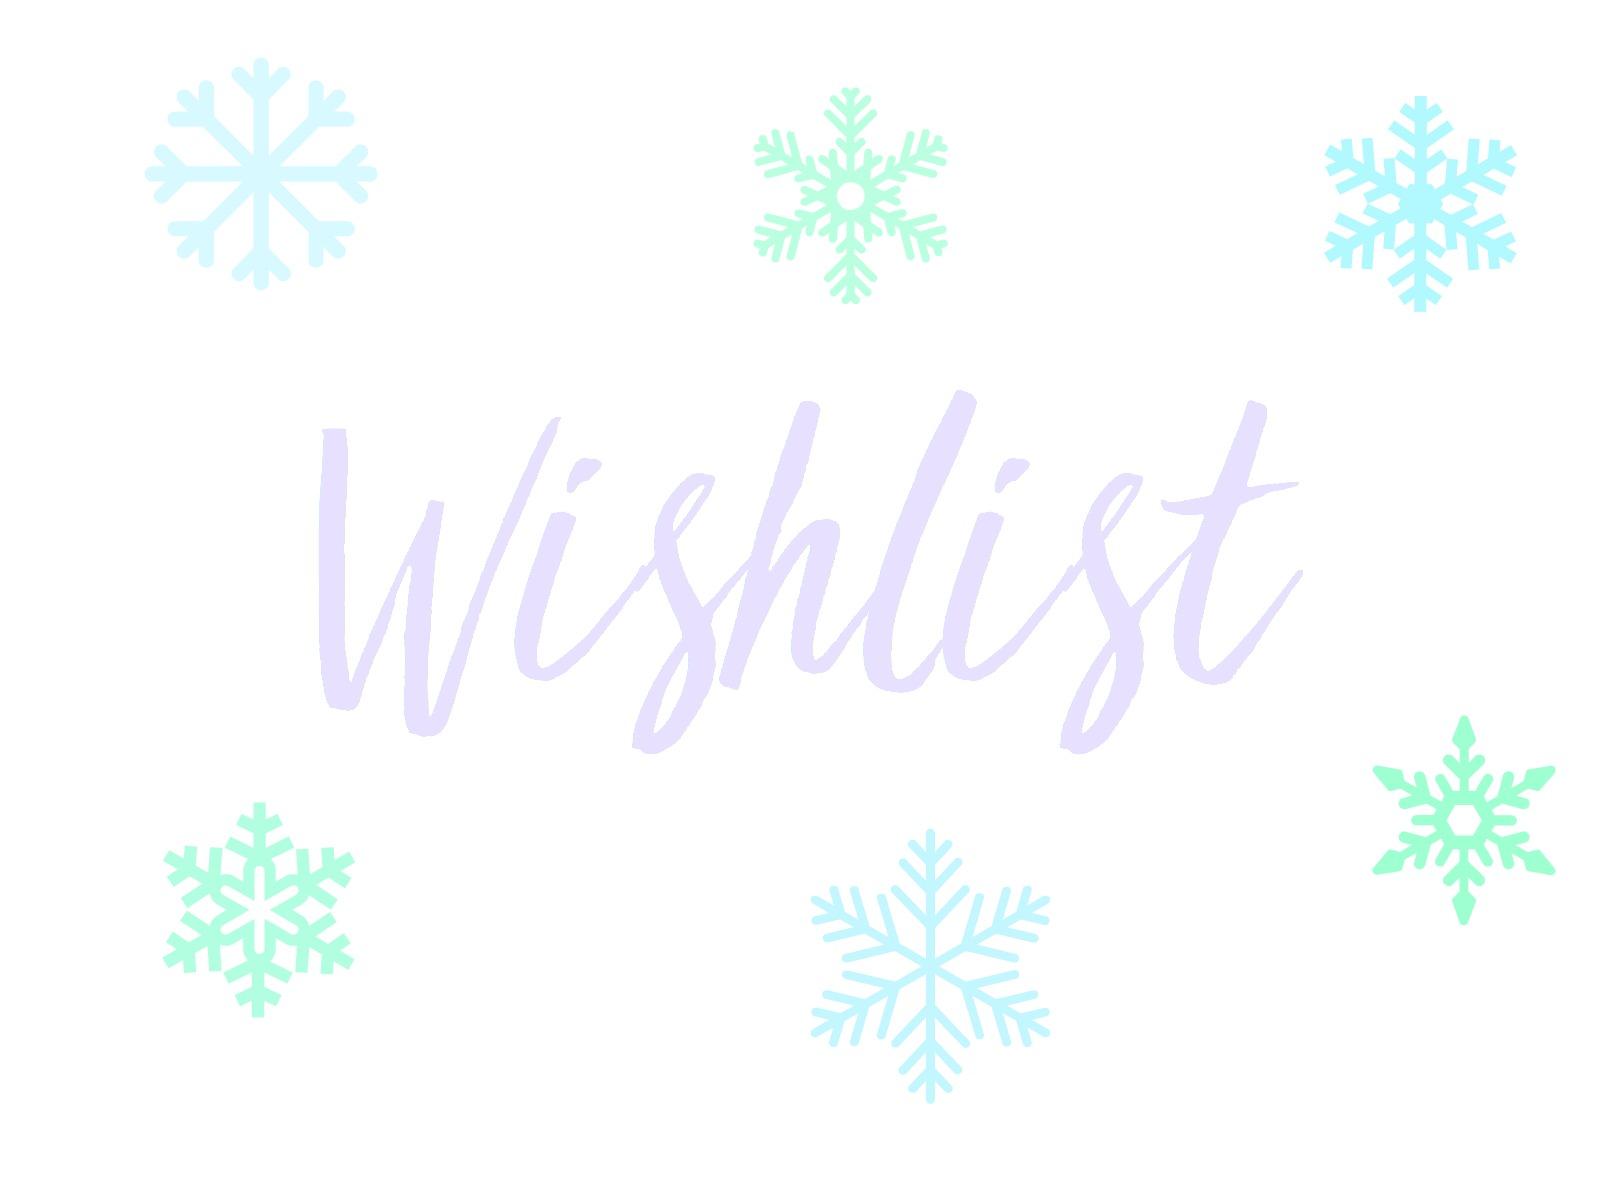 whislist